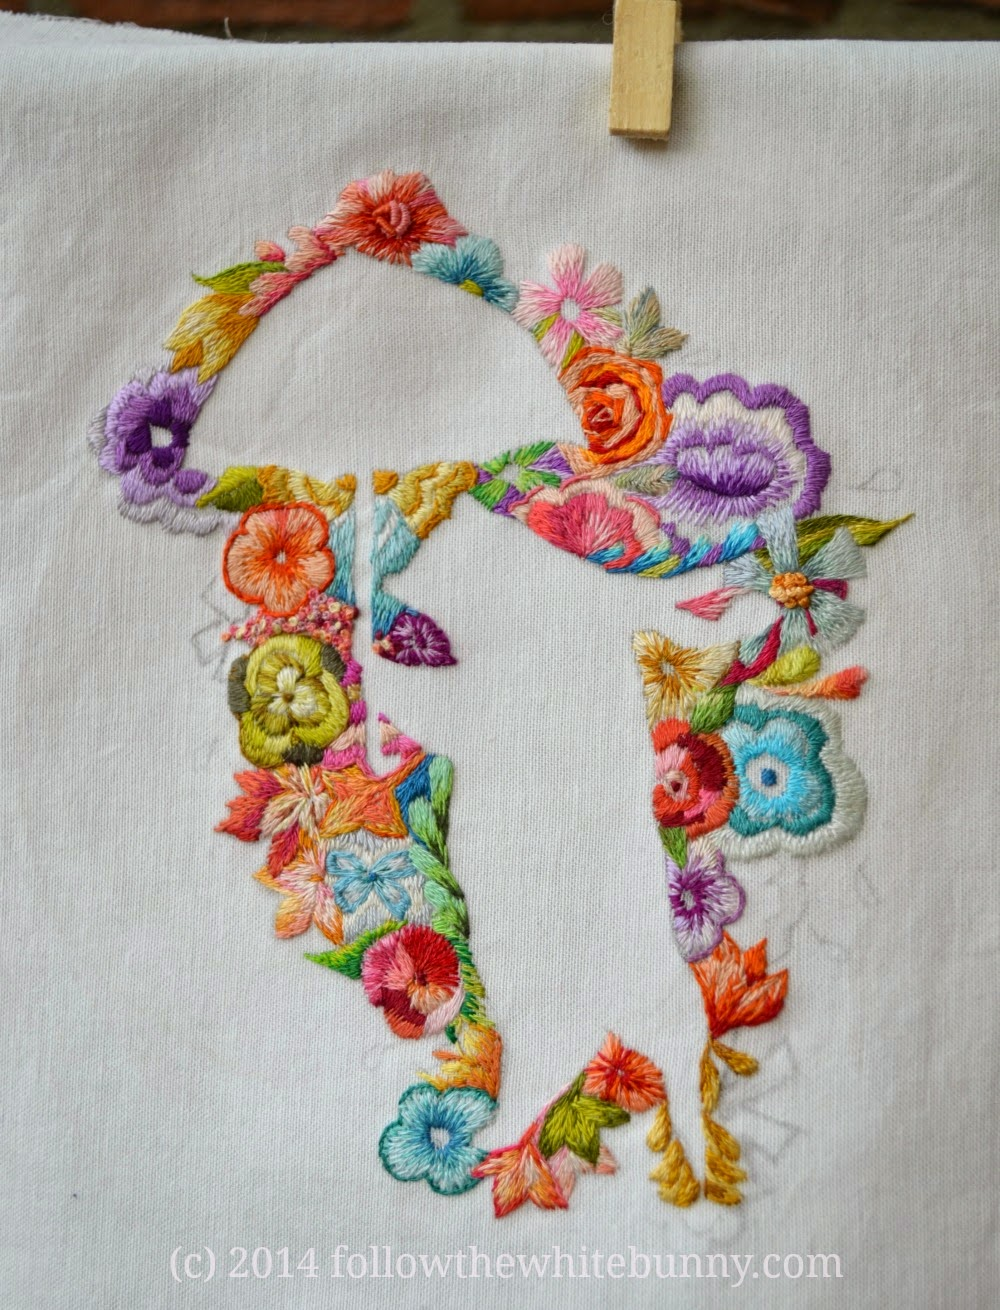 http://3.bp.blogspot.com/-S8iBNdw_sAs/VIbpYy0W5XI/AAAAAAAAGkg/r0vm2fCVkjM/s1600/flowerbear.jpg